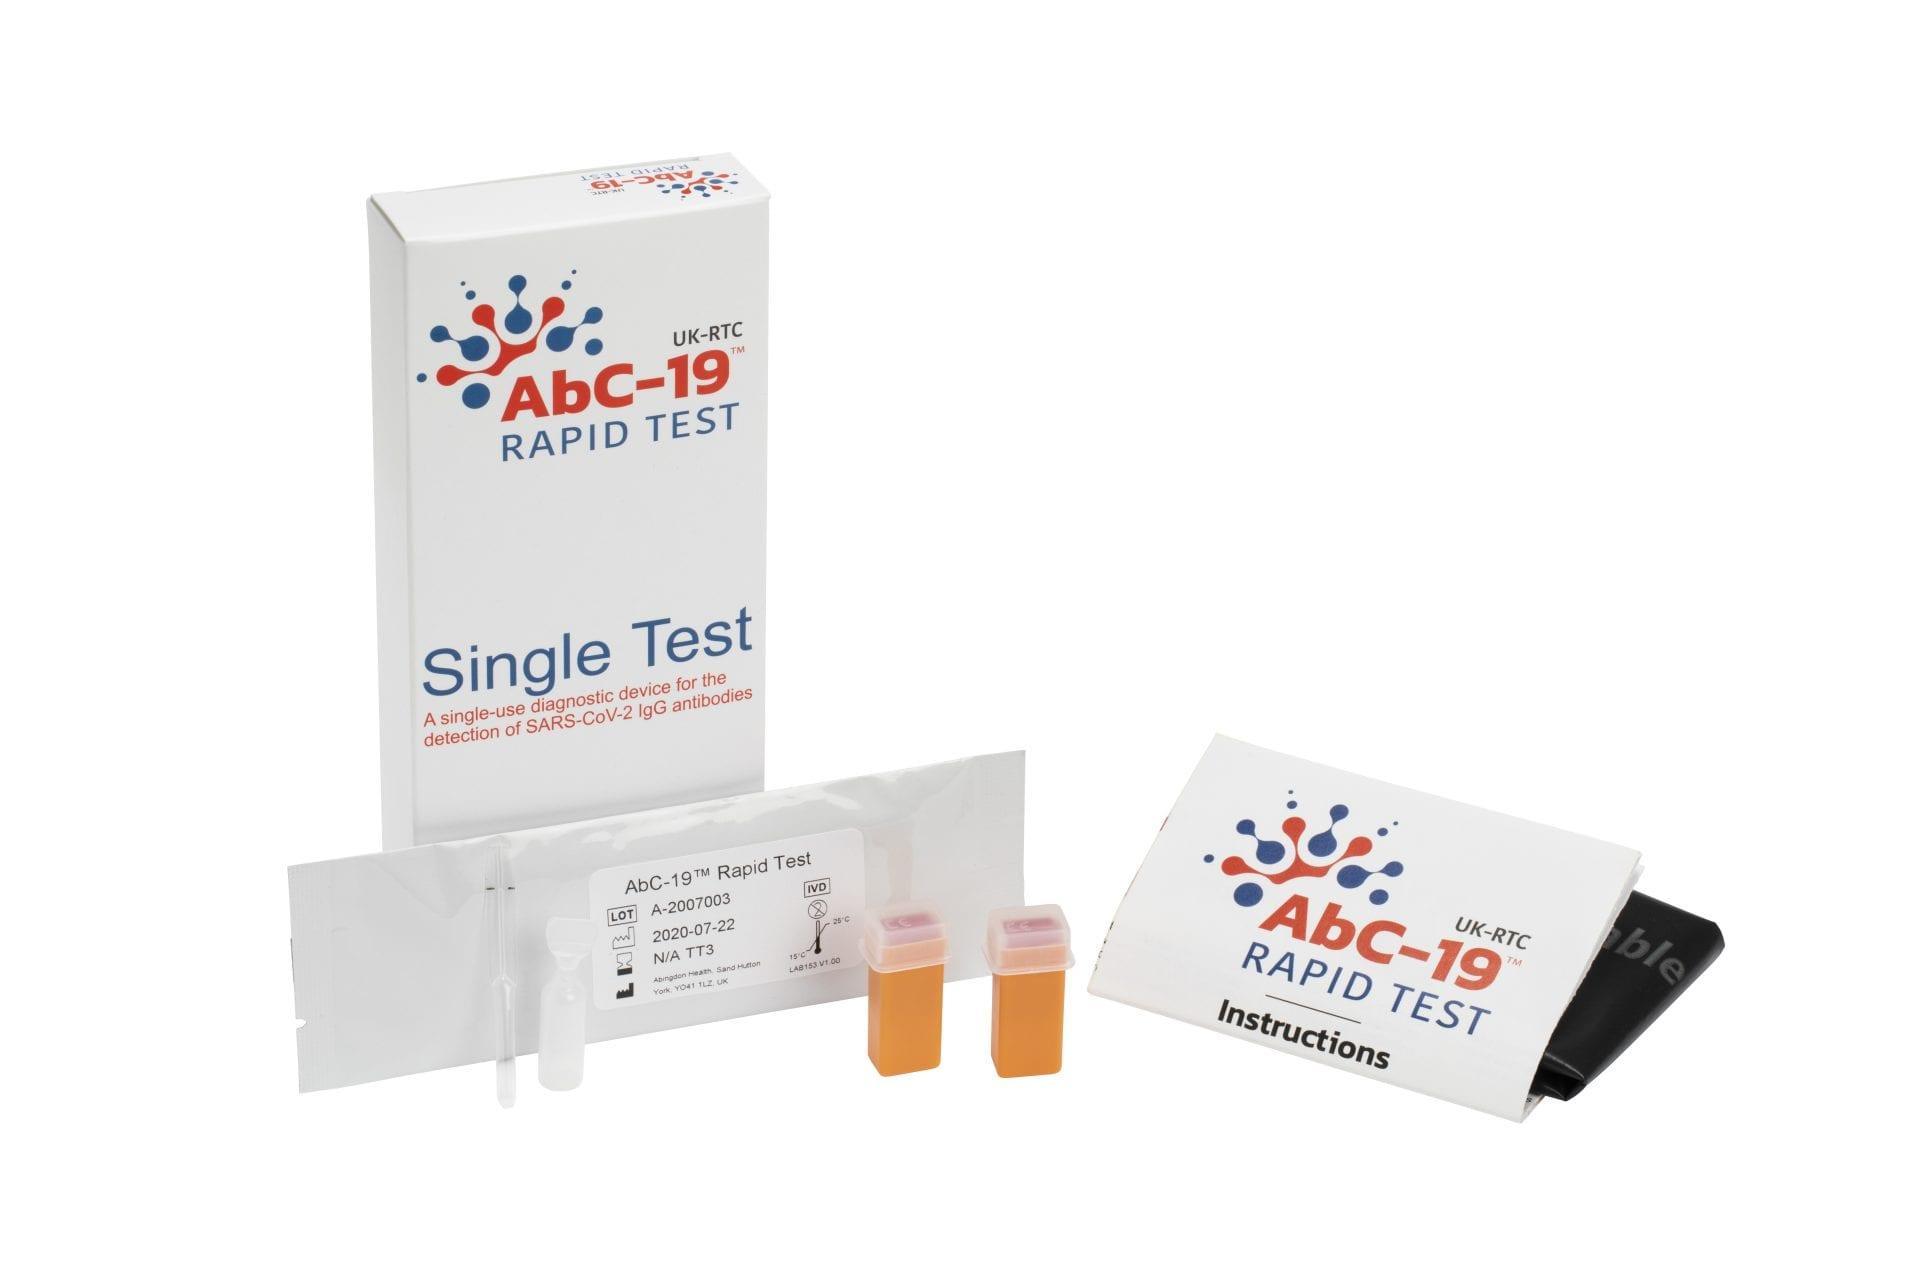 abc-19 antibody rapid test uk-rtc